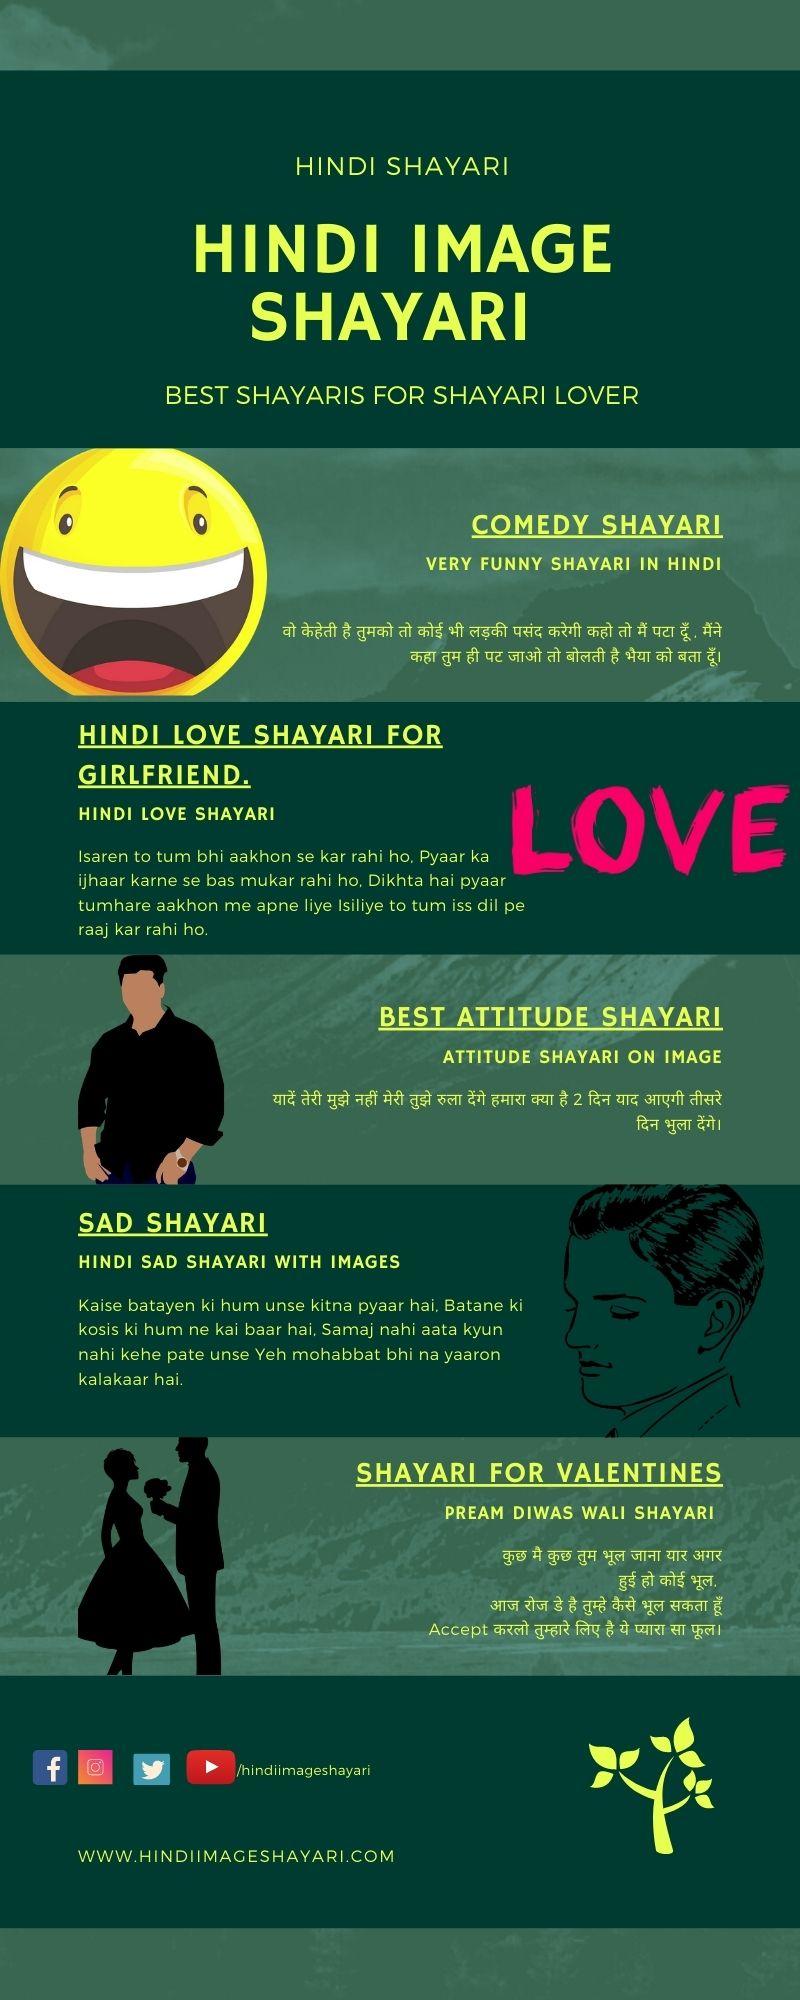 Hindi Image Shayari Infographic